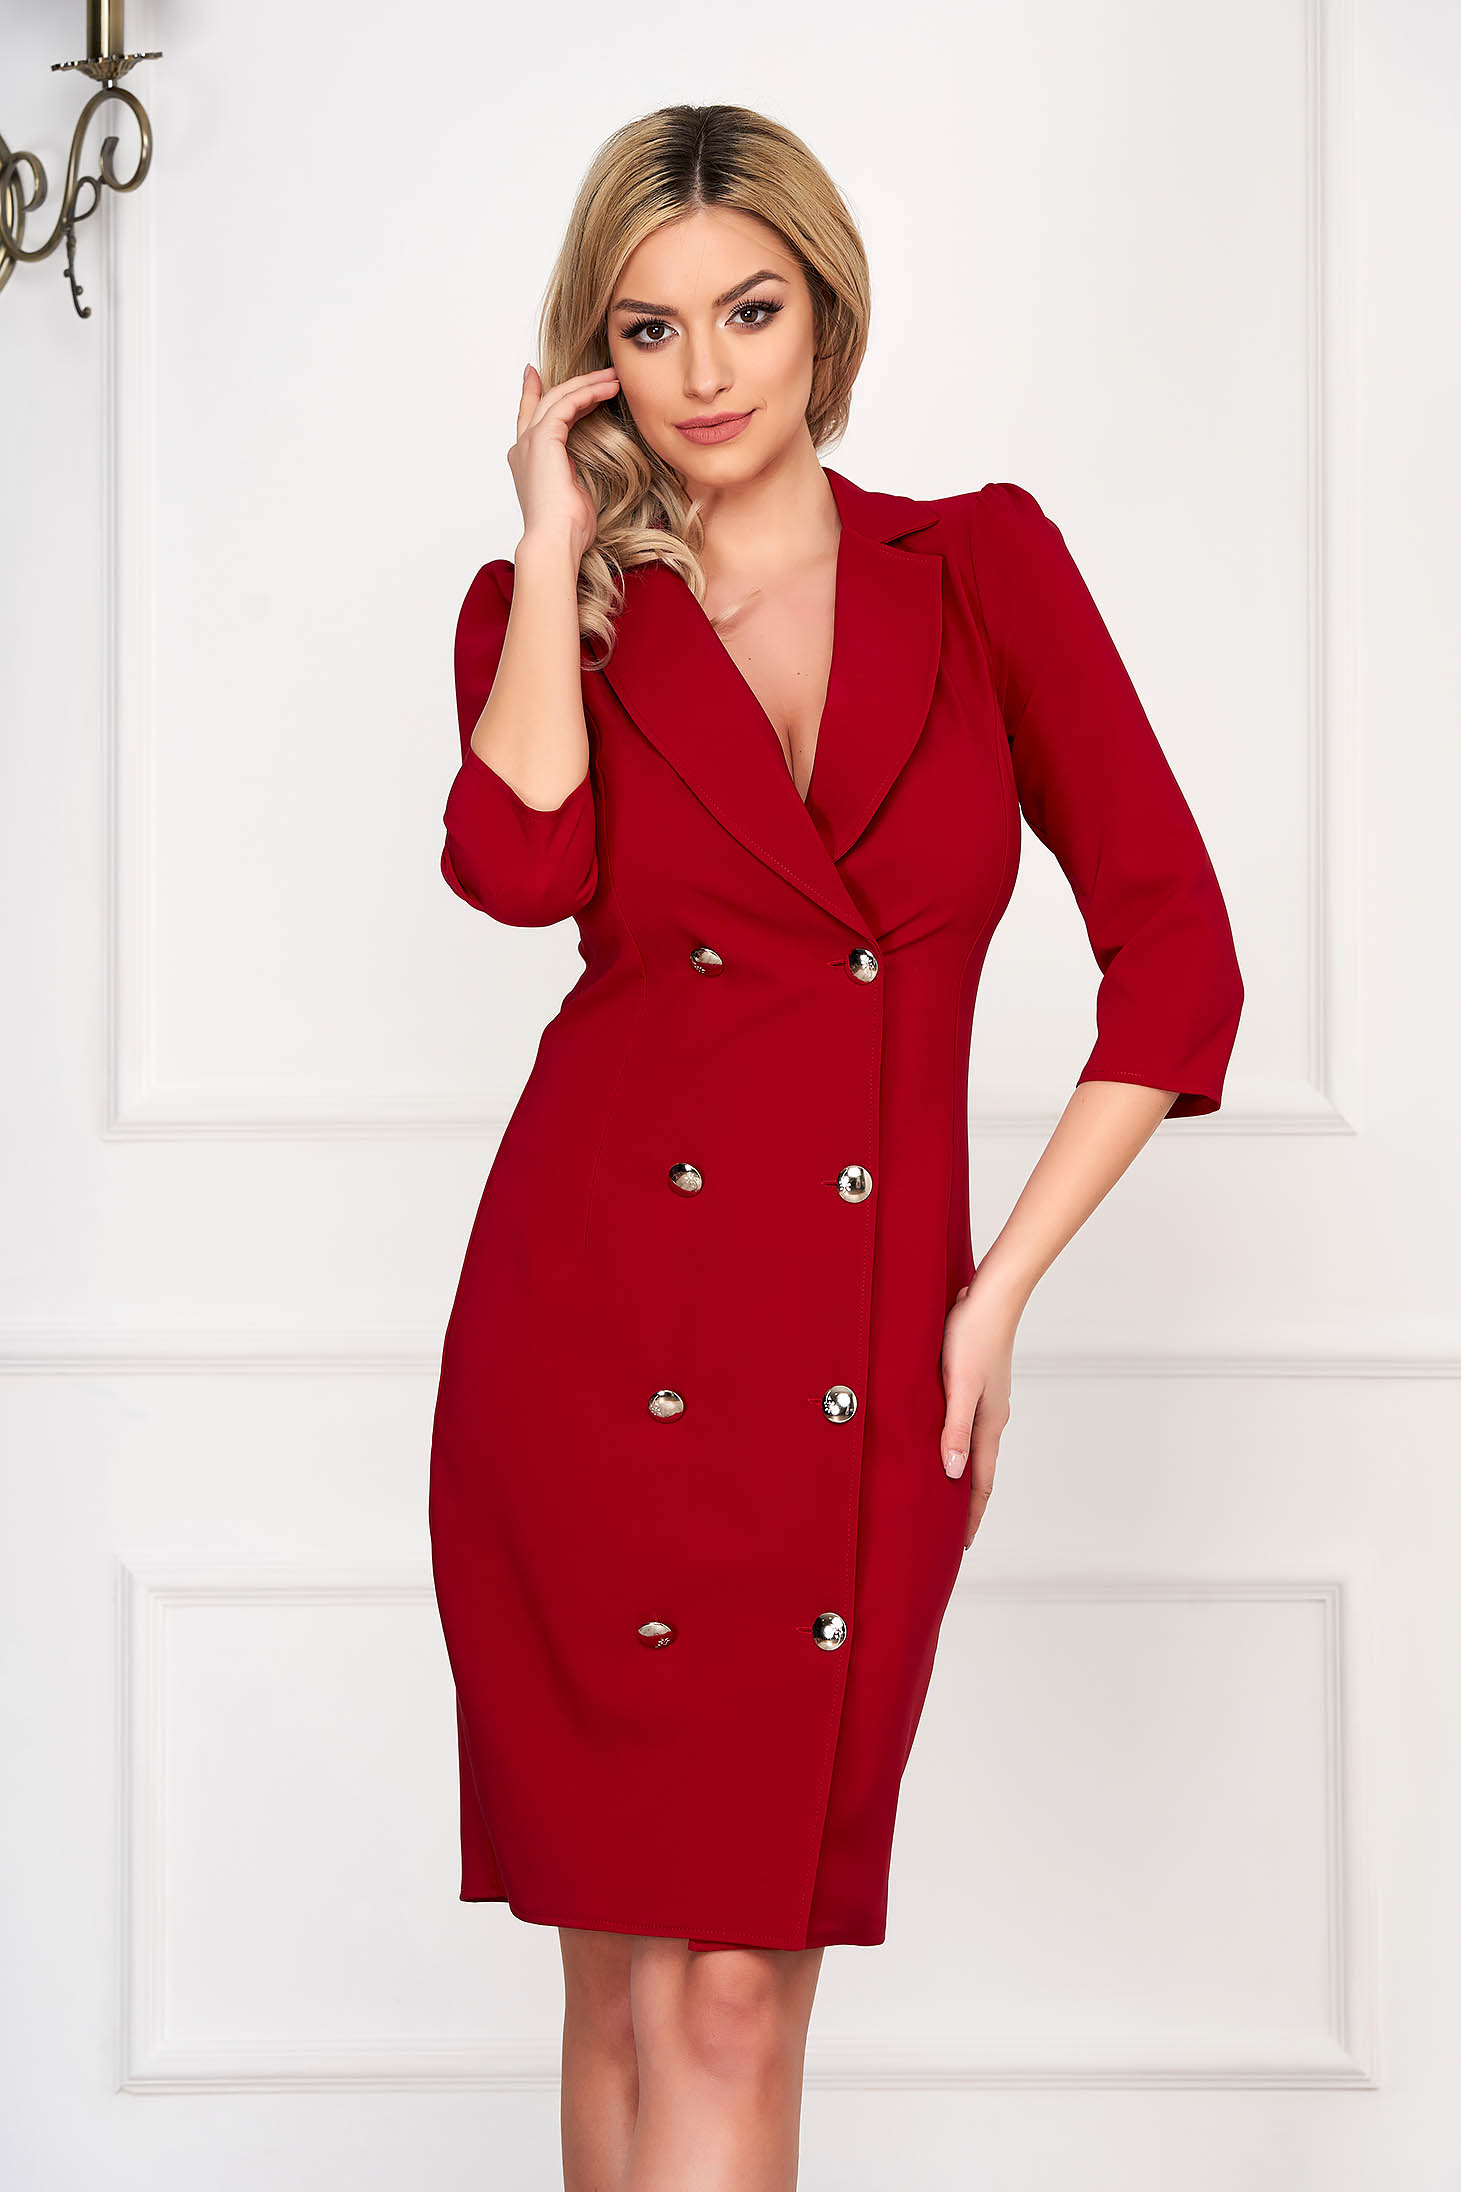 Artista red elegant blazer type dress slightly elastic fabric wrap around with button accessories